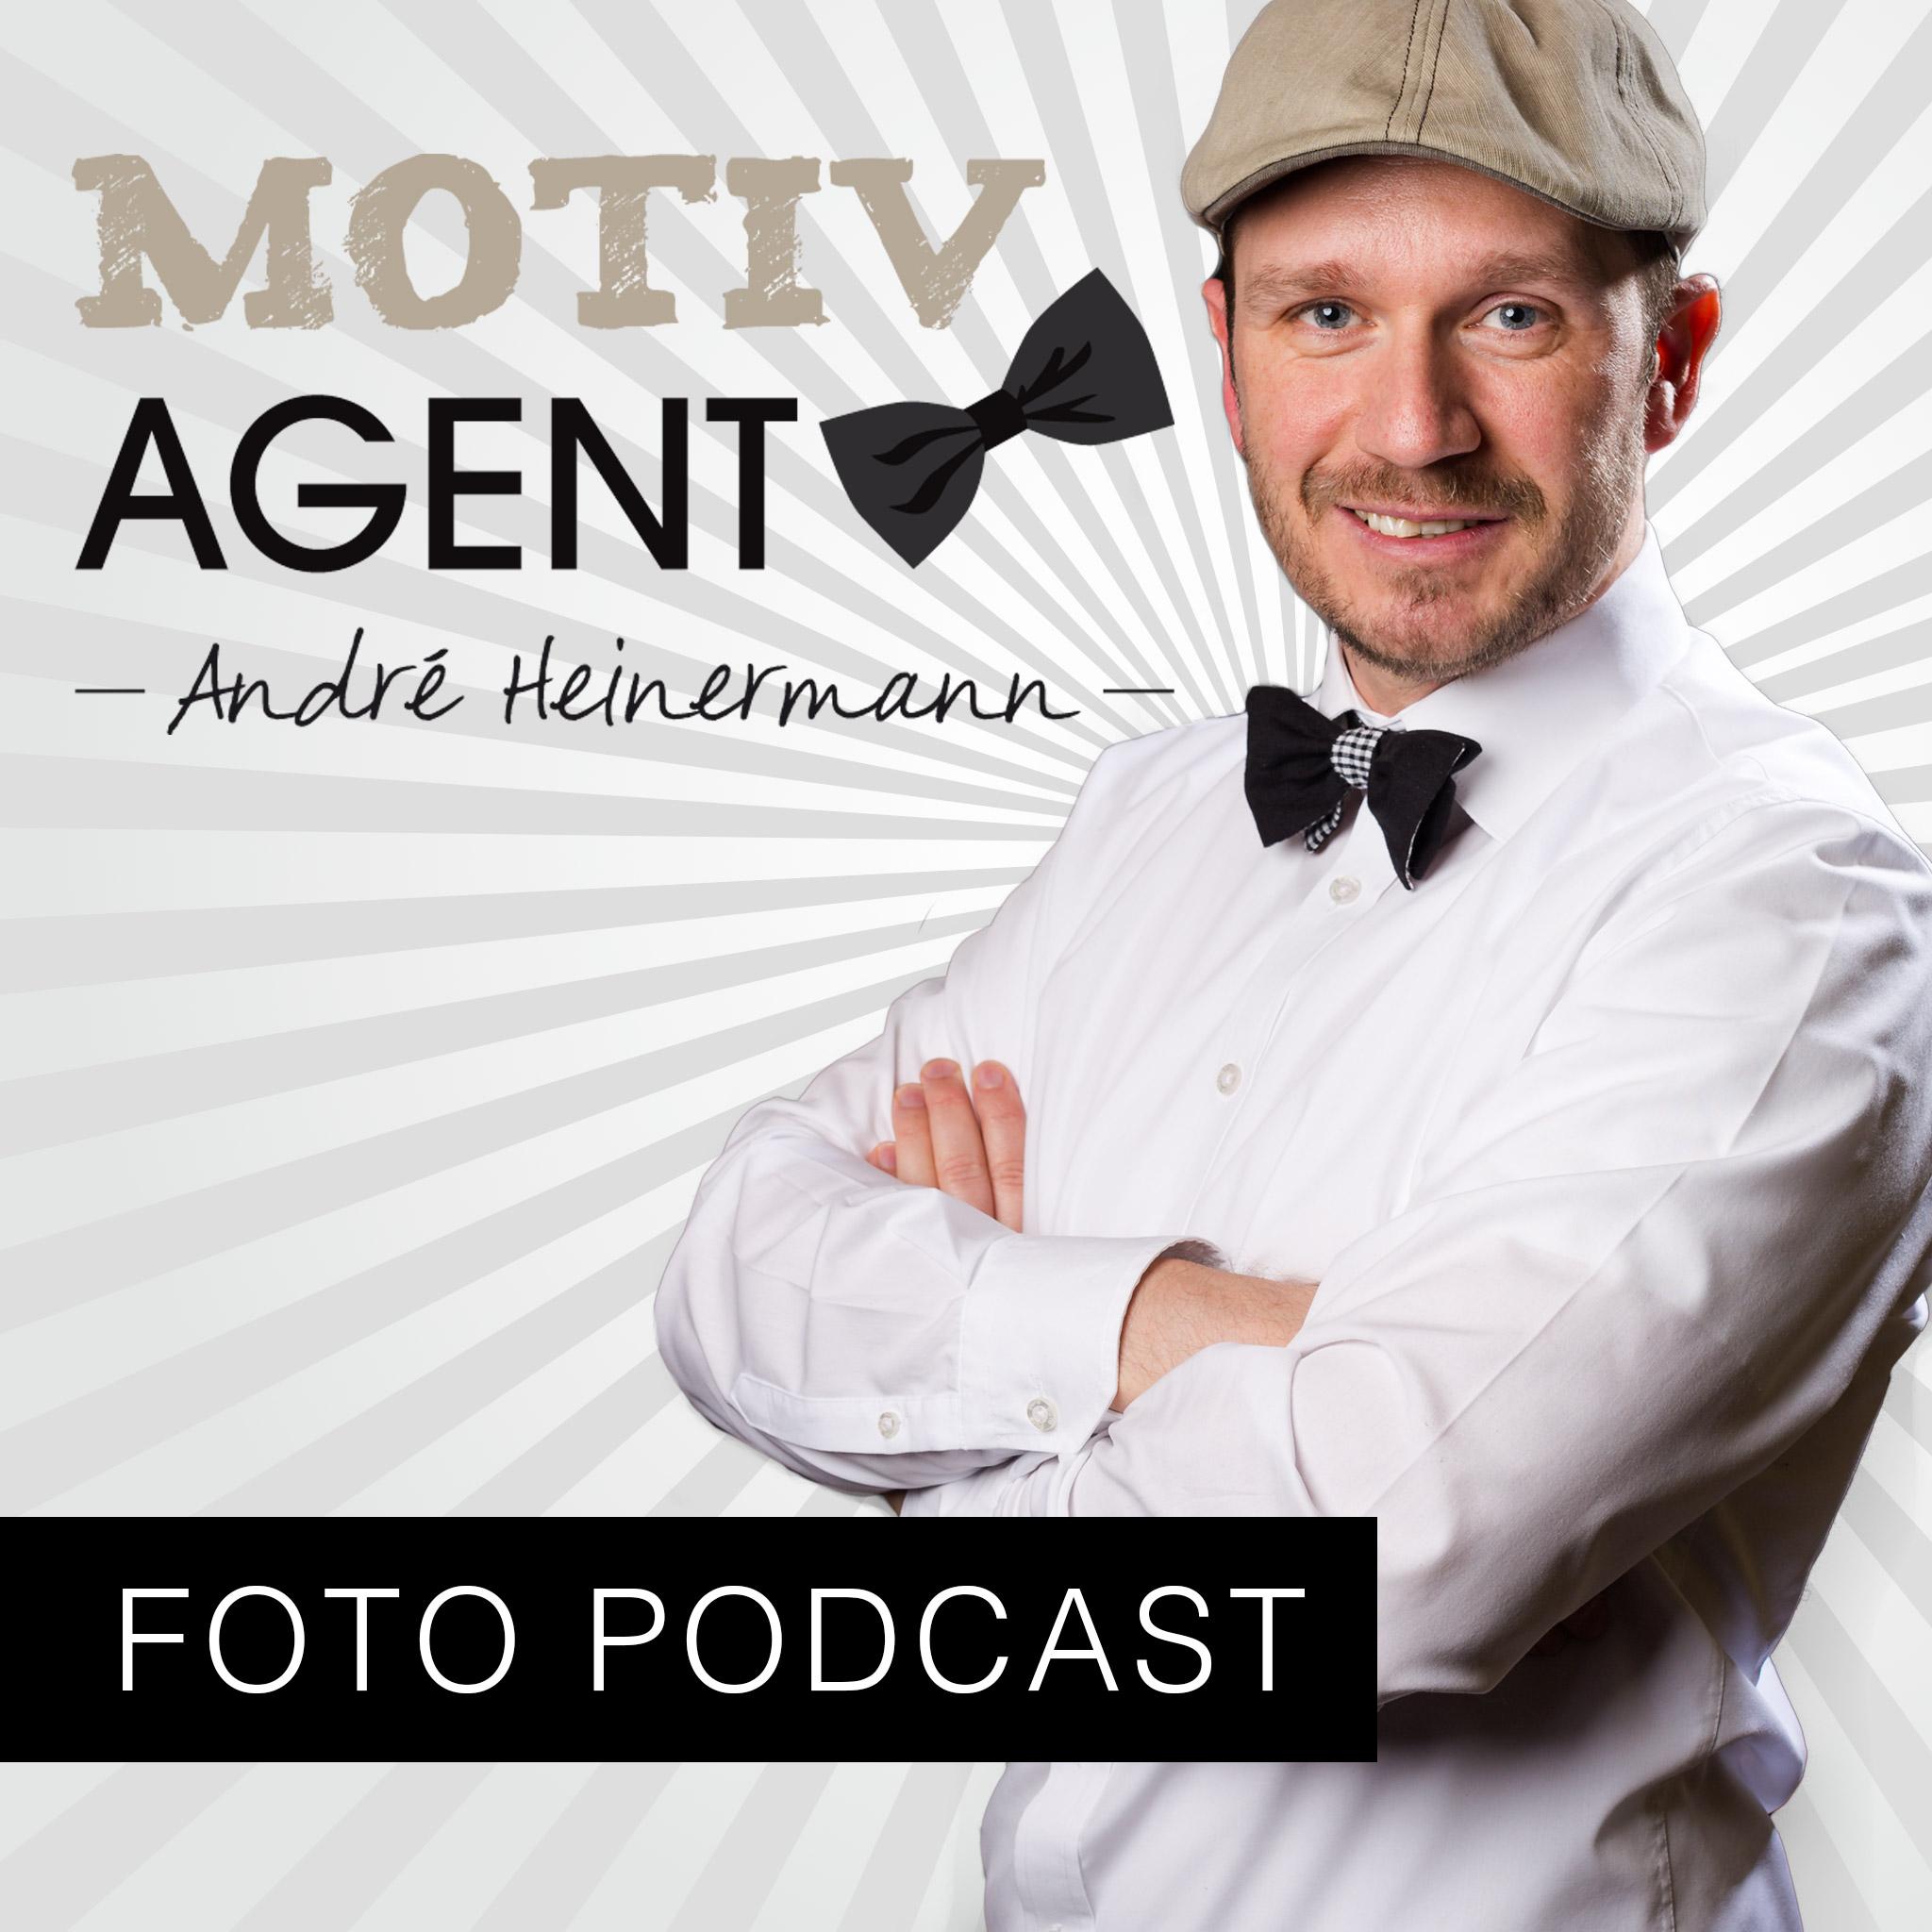 Motivagent | André Heinermann Foto Podcast